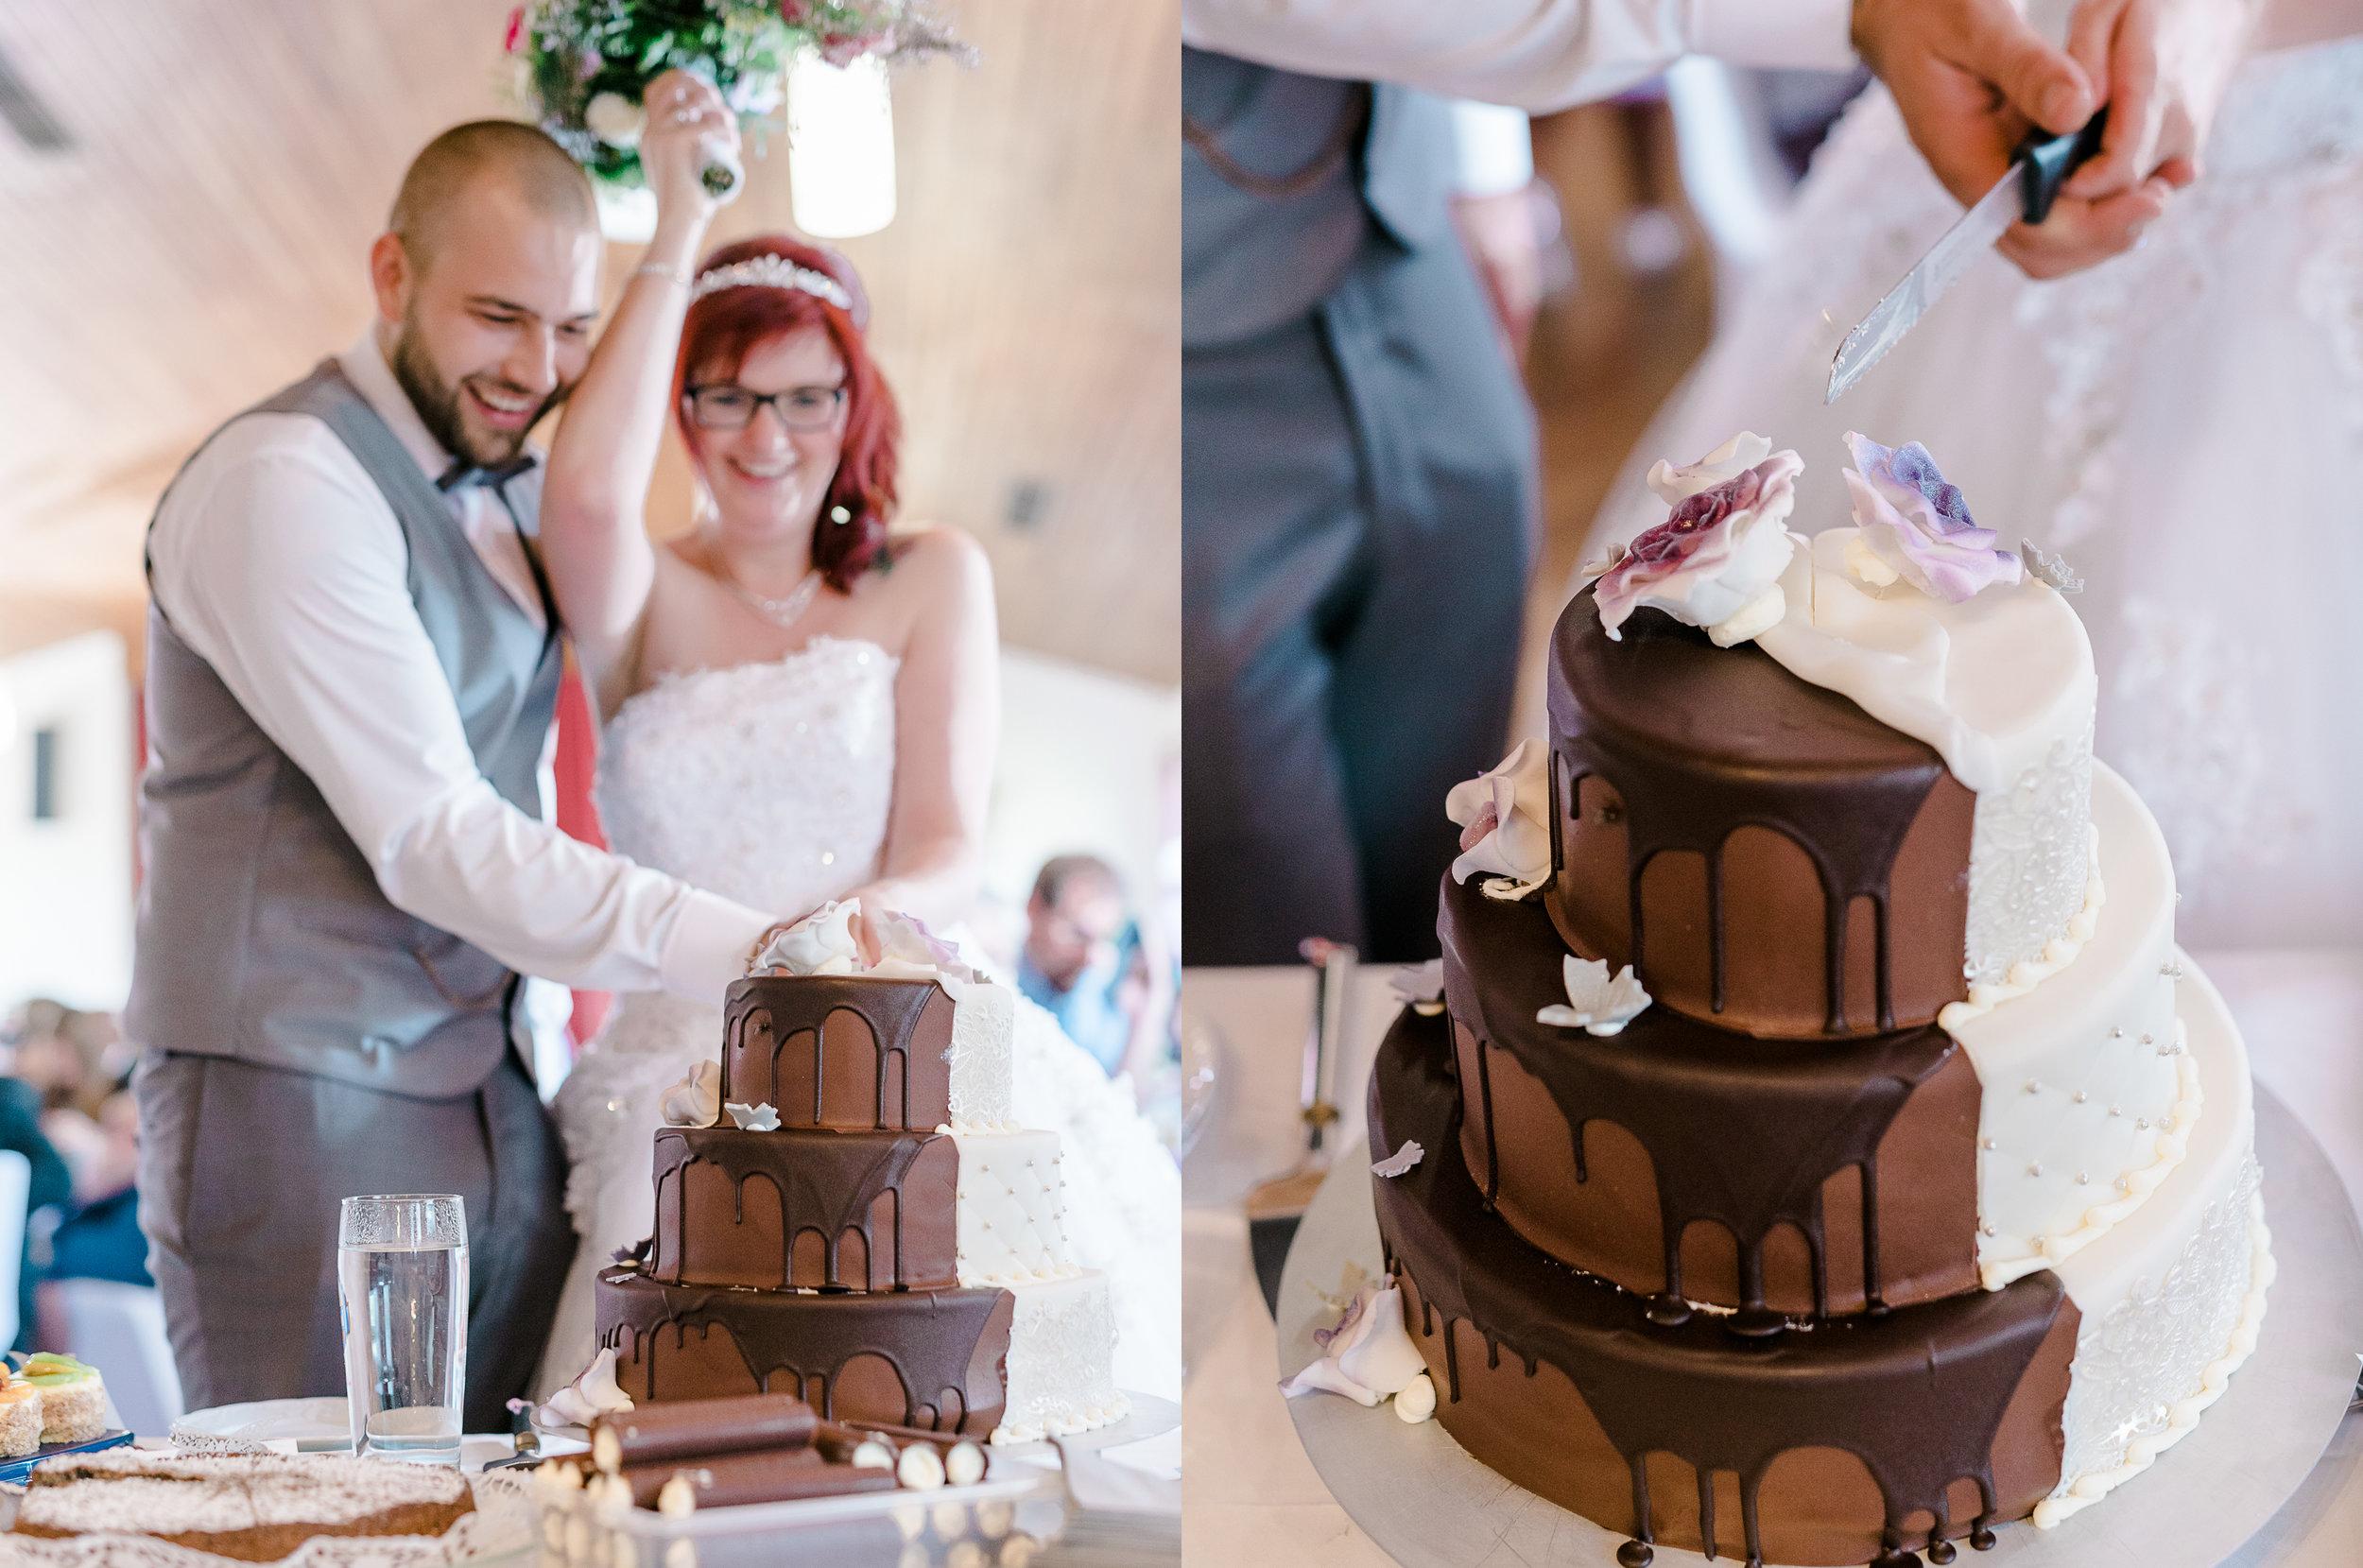 CakeCutting-1.jpg